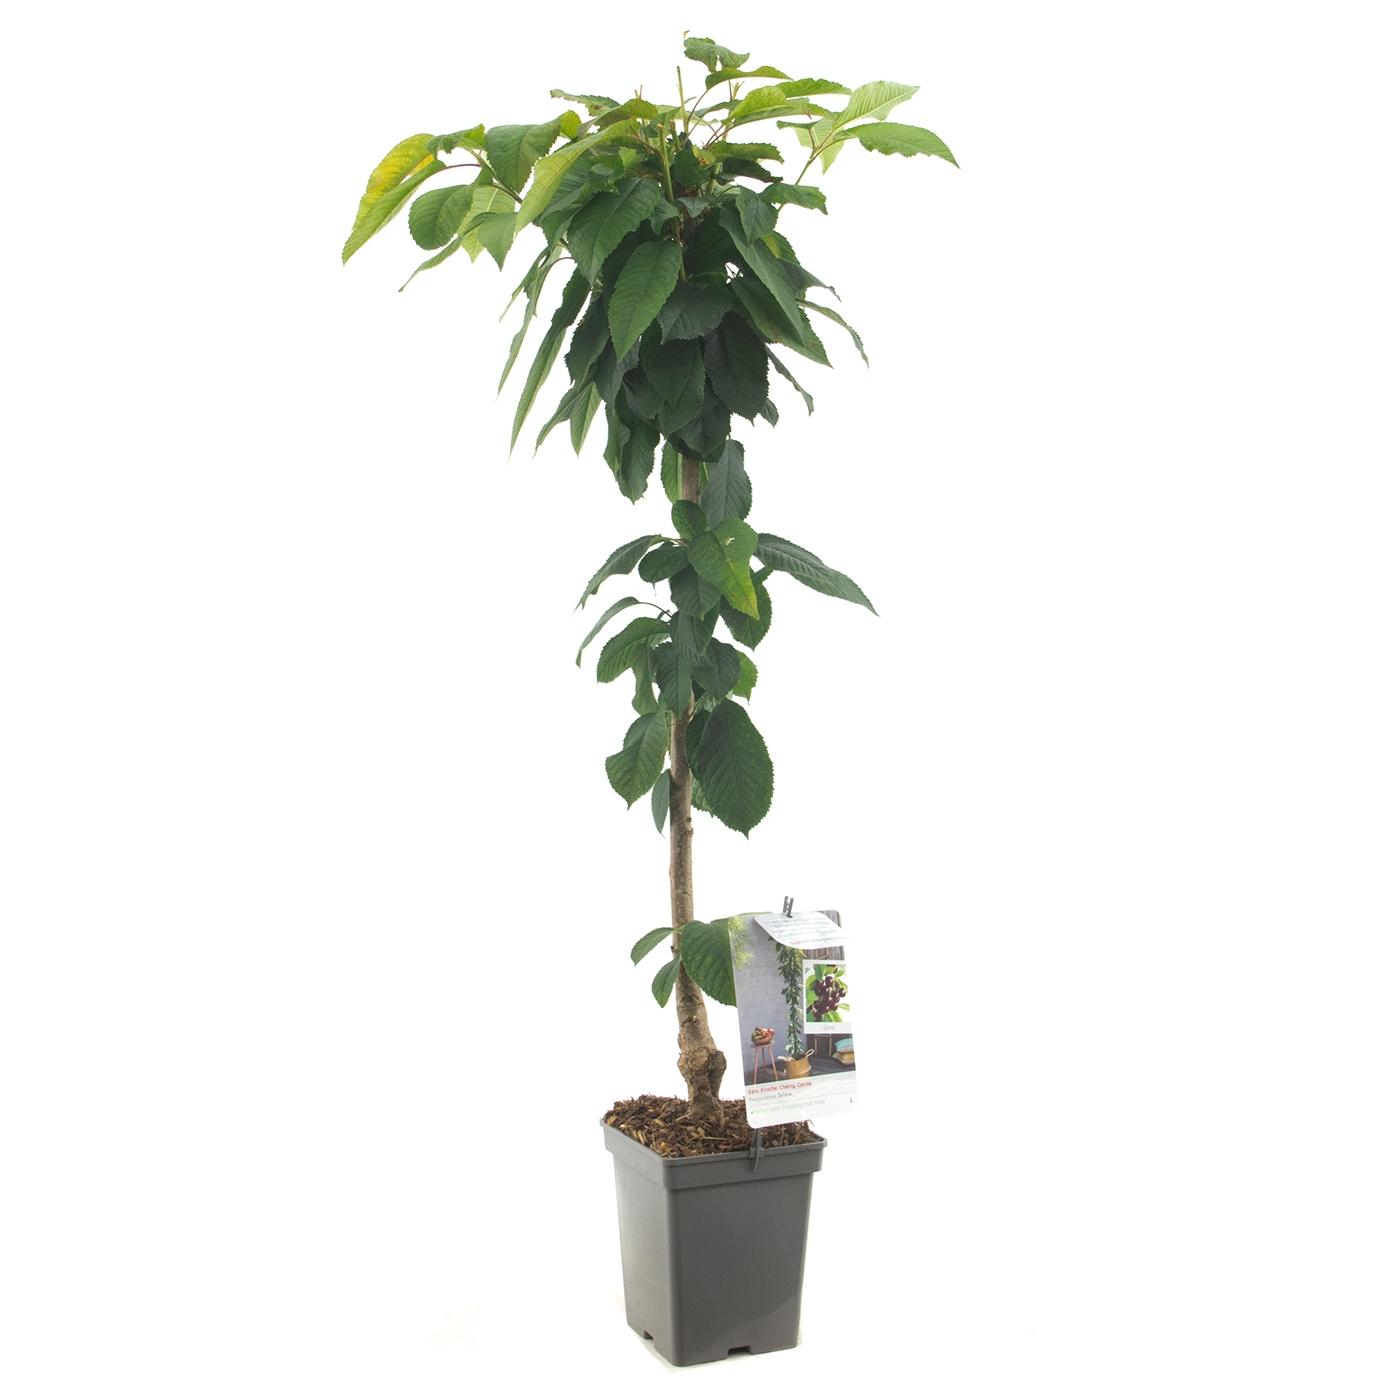 Zuil-kersenboom Prunus avium 'Sylvia'